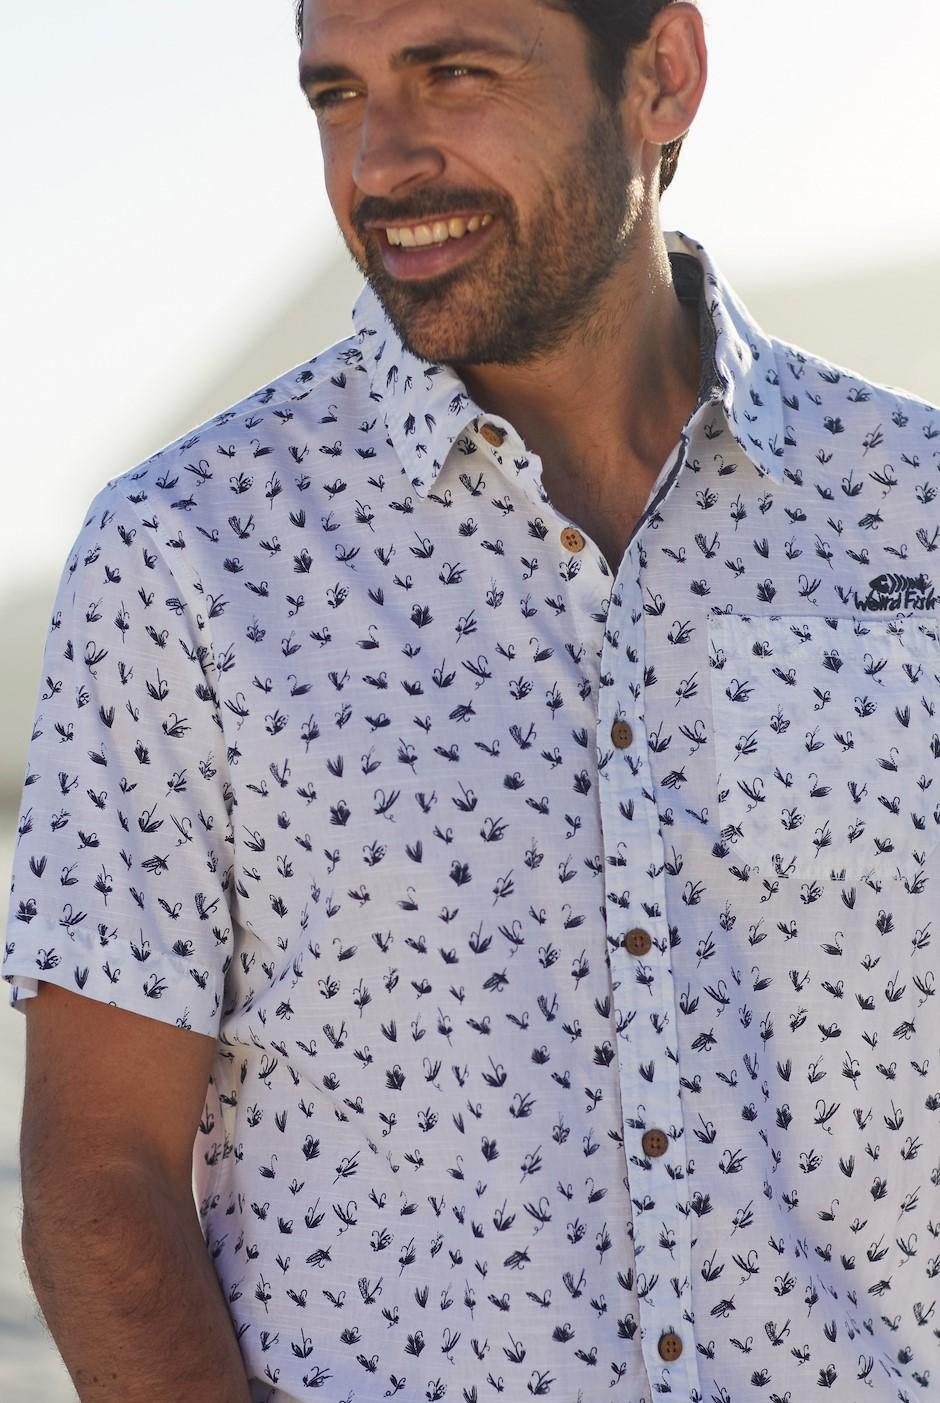 Milbay Print Cotton Short Sleeve Shirt Dusty White